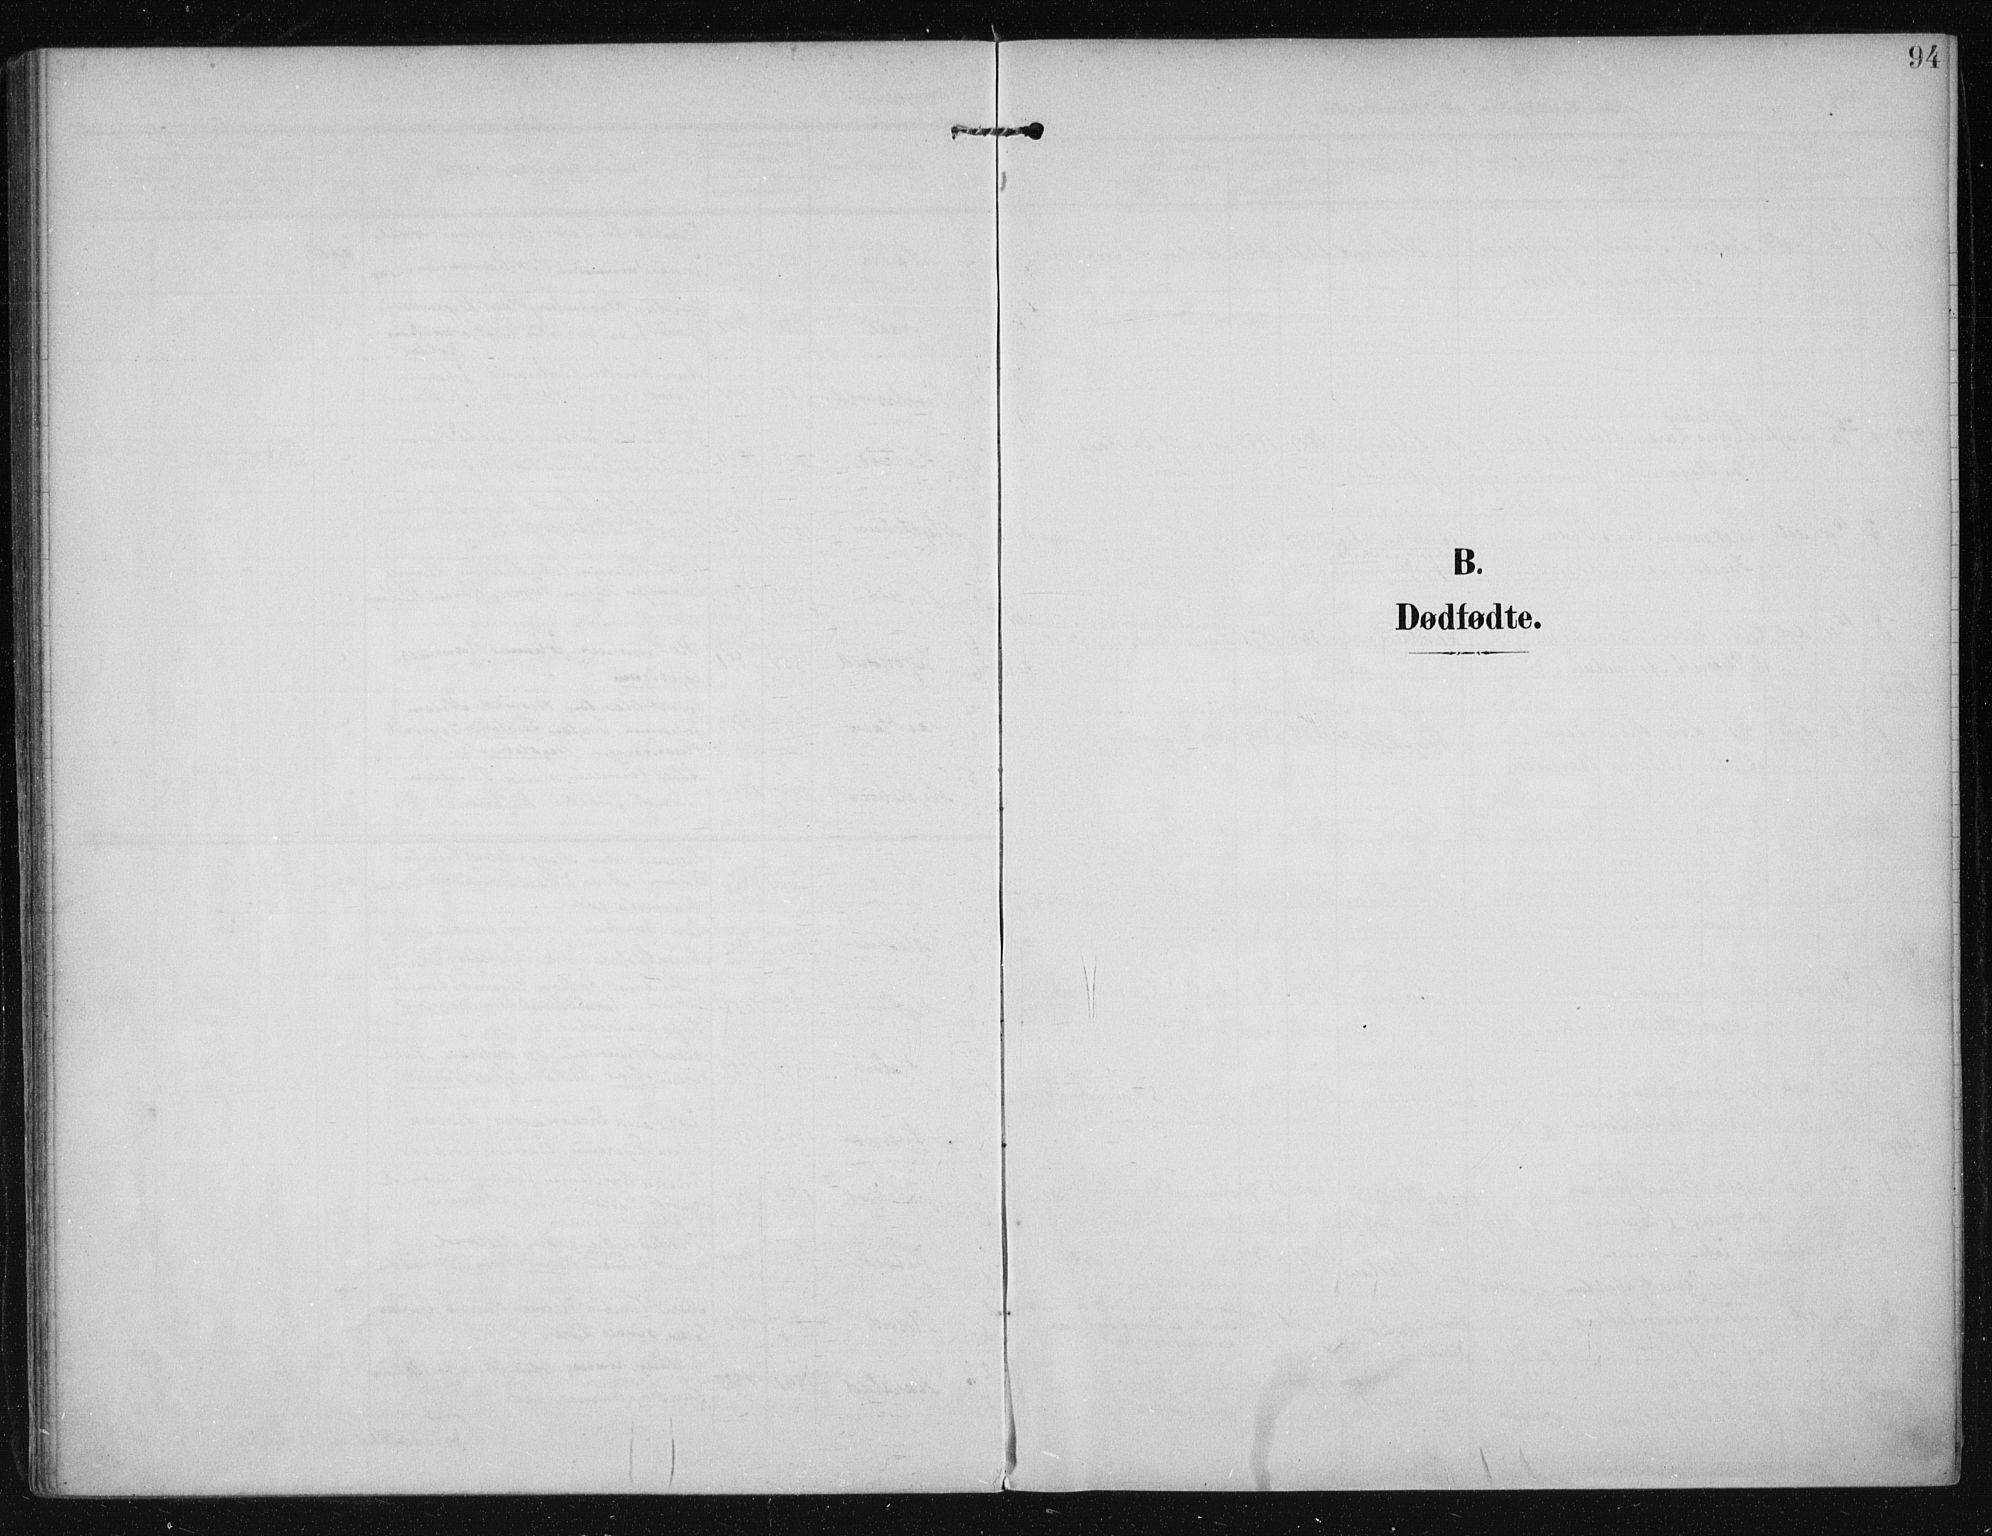 SAST, Egersund sokneprestkontor, Ministerialbok nr. A 20, 1906-1923, s. 94